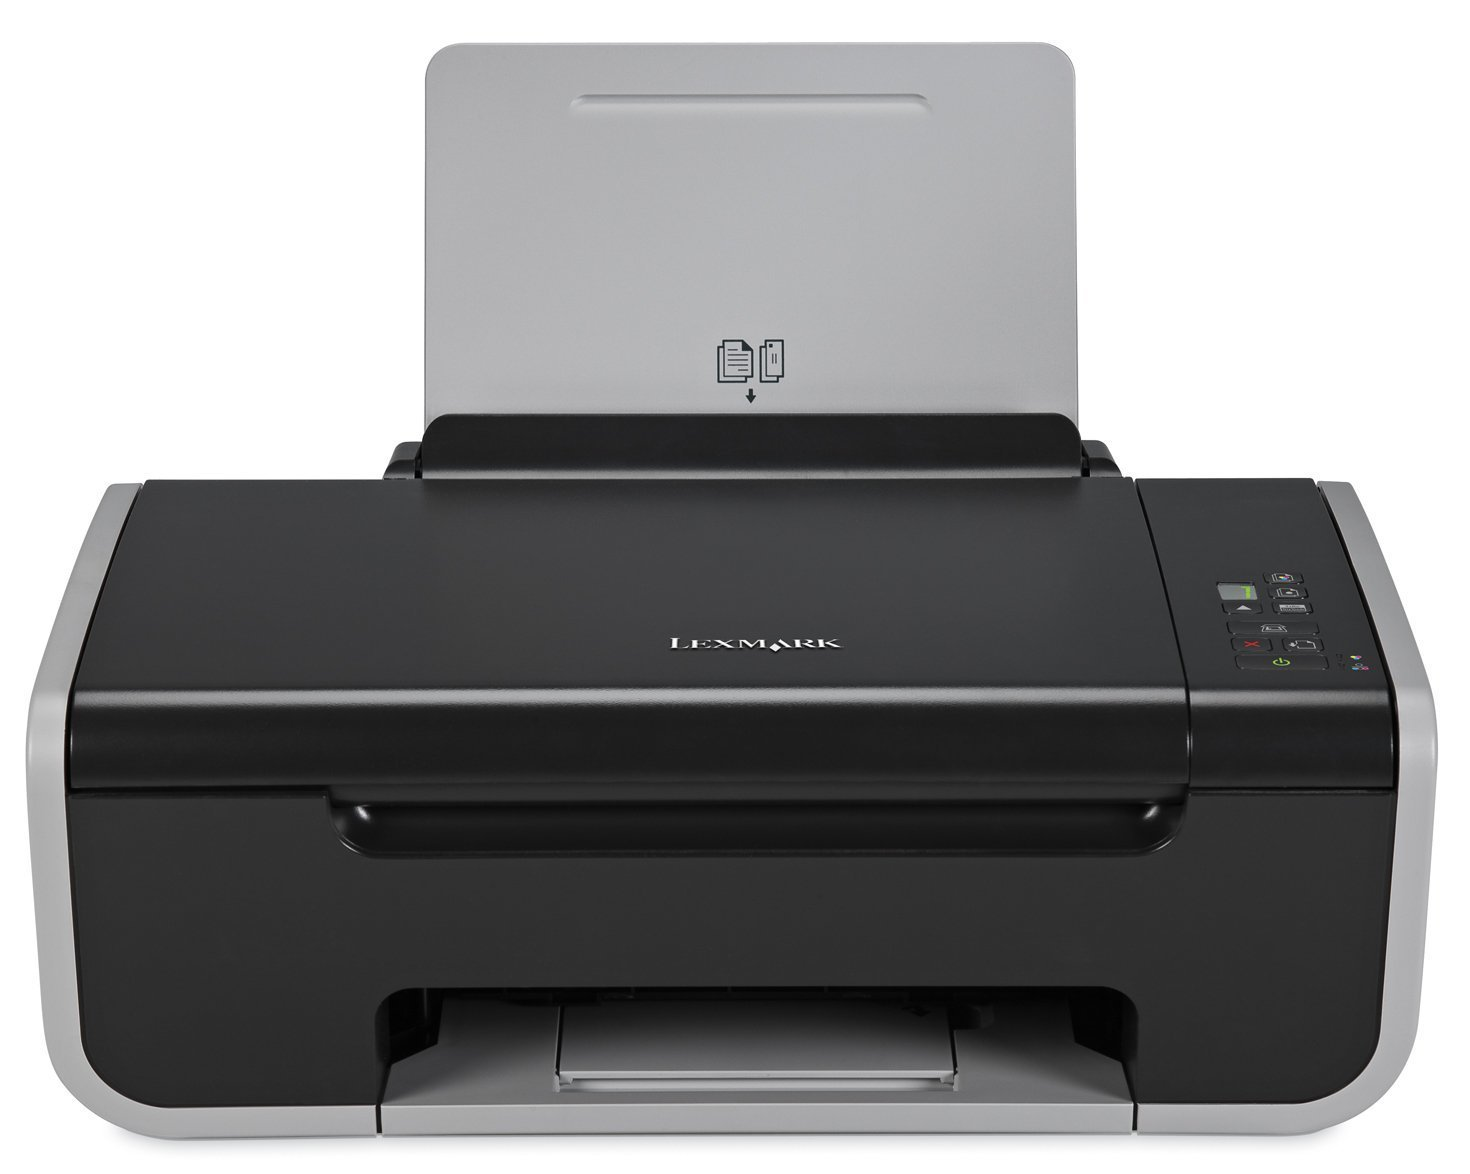 logiciel installation imprimante lexmark x2670